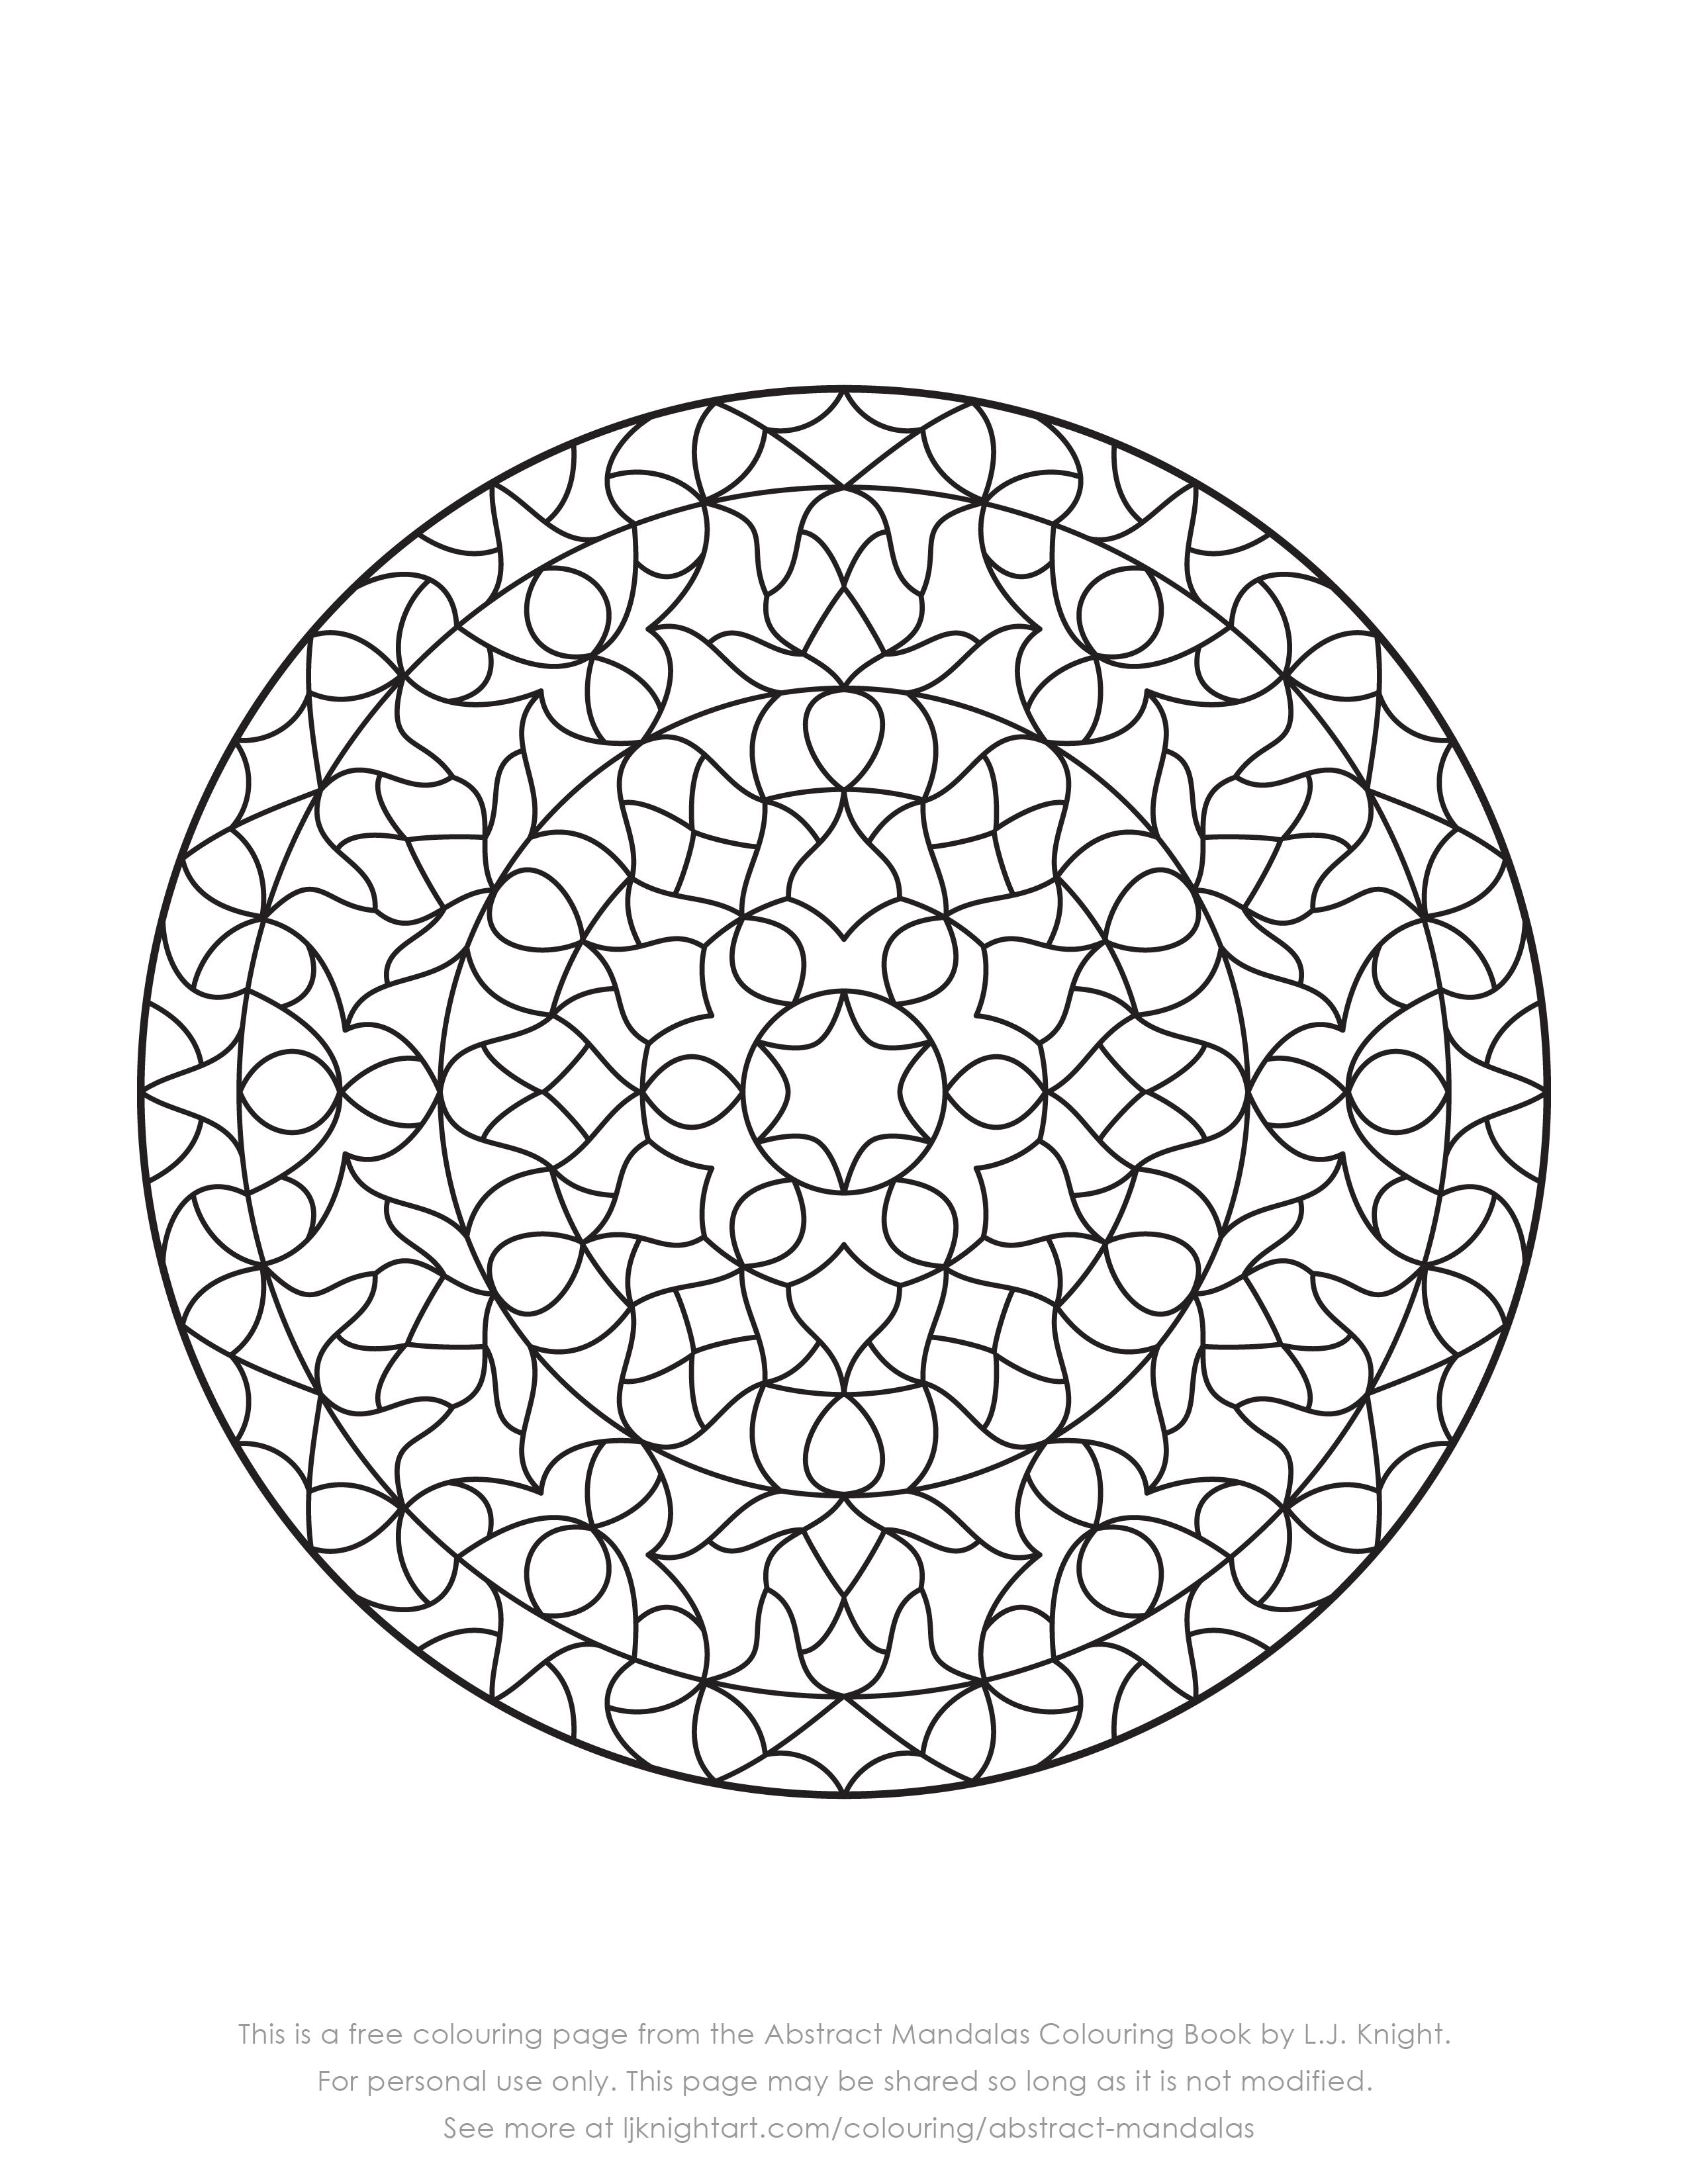 Free Abstract Mandala Colouring Page Download | L.J. Knight